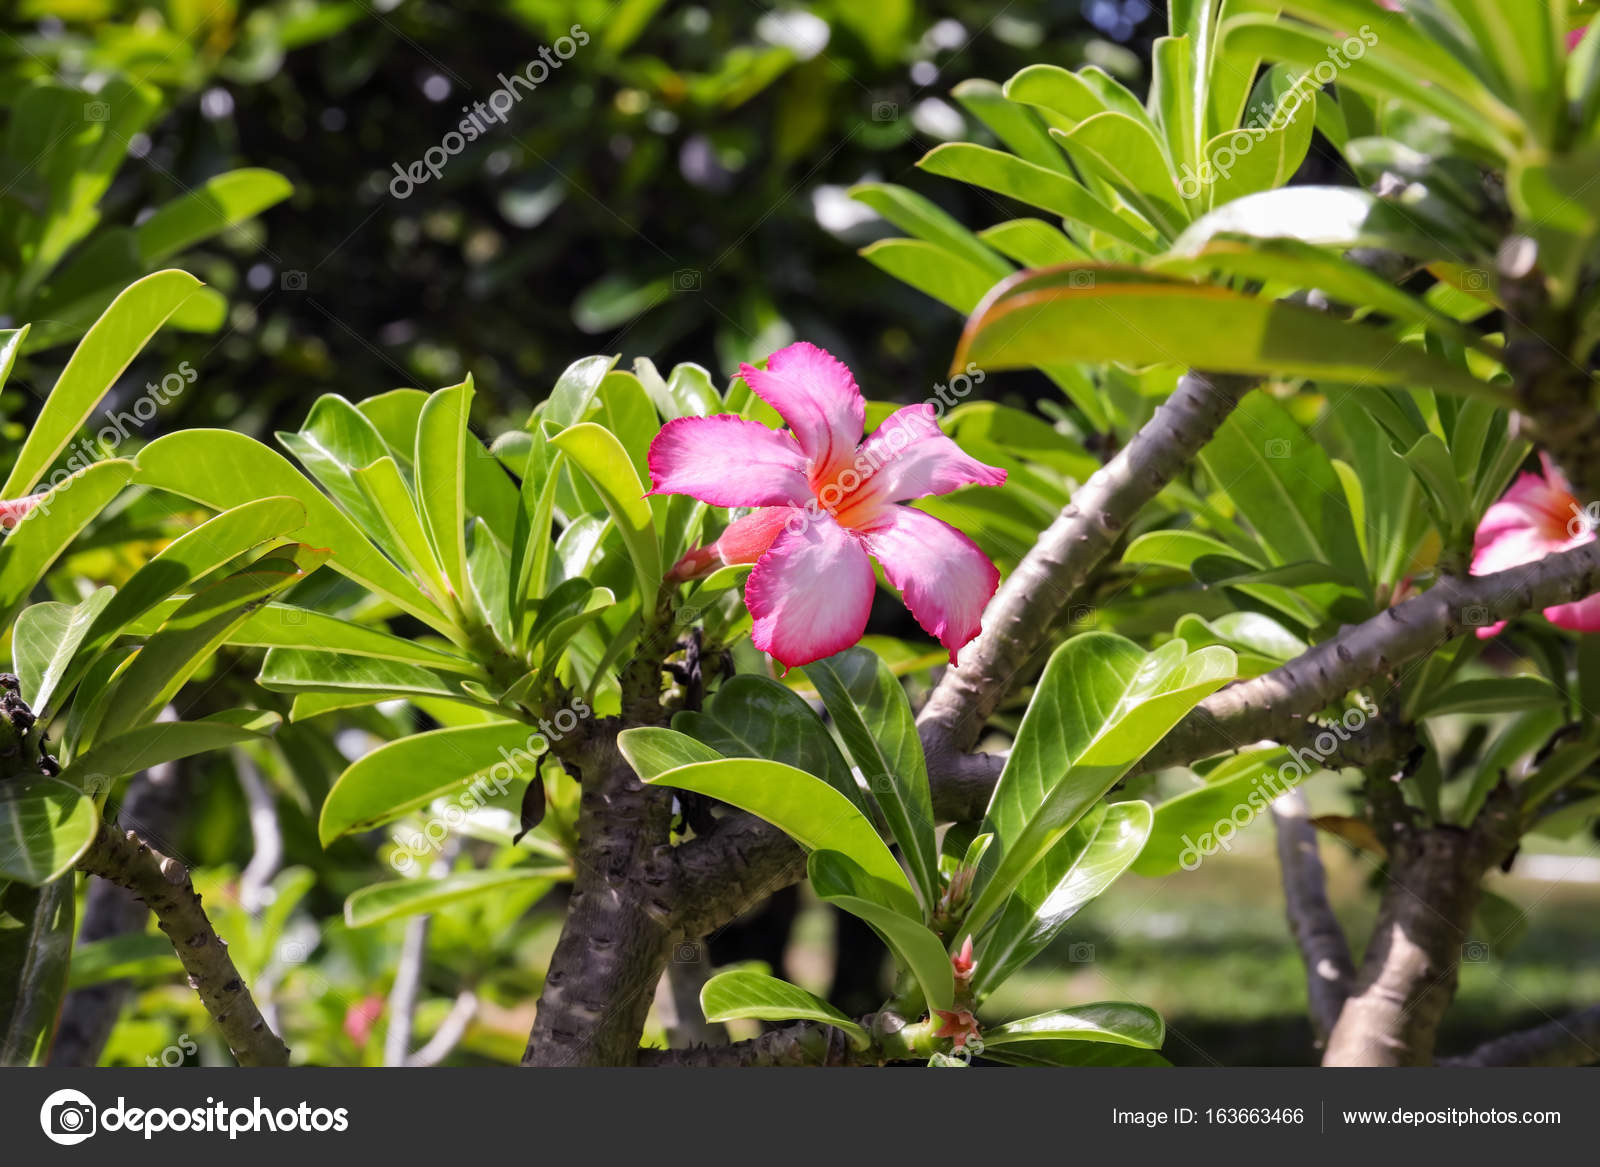 Beautiful tropical flowers stock photo belchonock 163663466 beautiful pink tropical flowers outdoors photo by belchonock izmirmasajfo